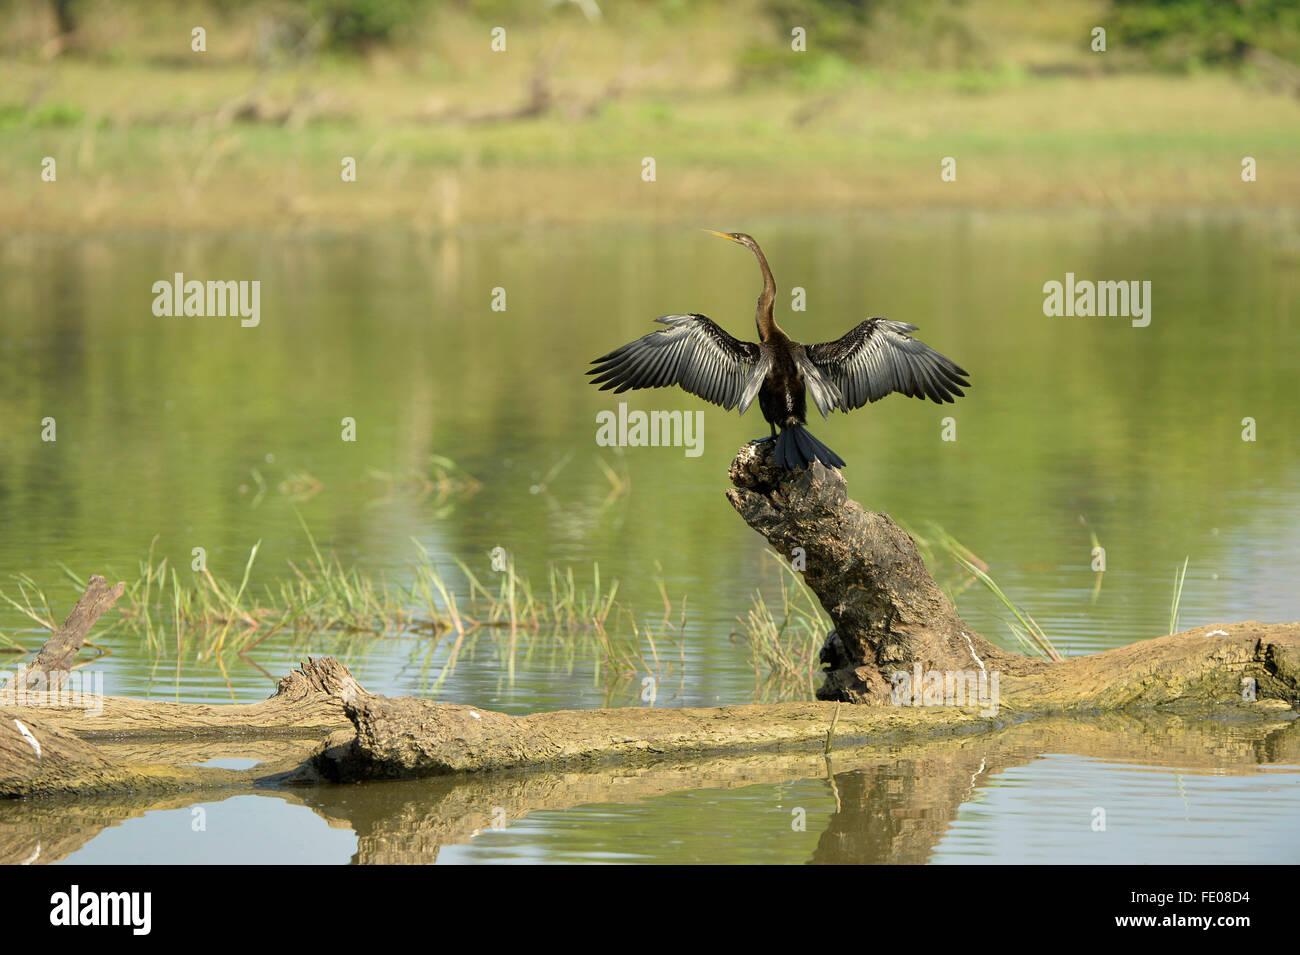 Snake Bird (Anhinga anhinga) perched on dead tree, drying wings, Yala National Park, Sri Lanka, March - Stock Image